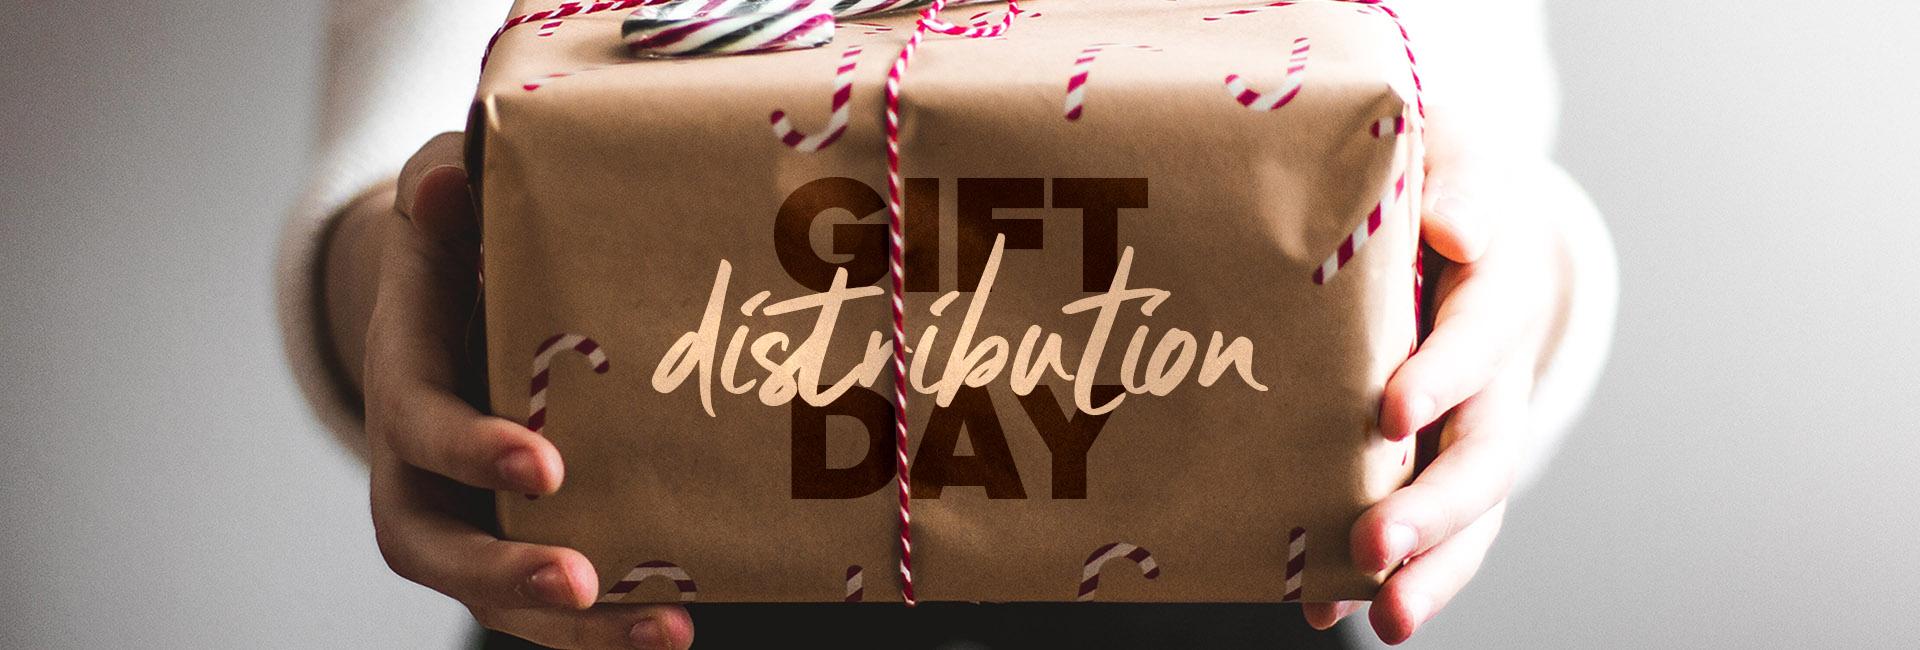 Gift Distribution Day Web